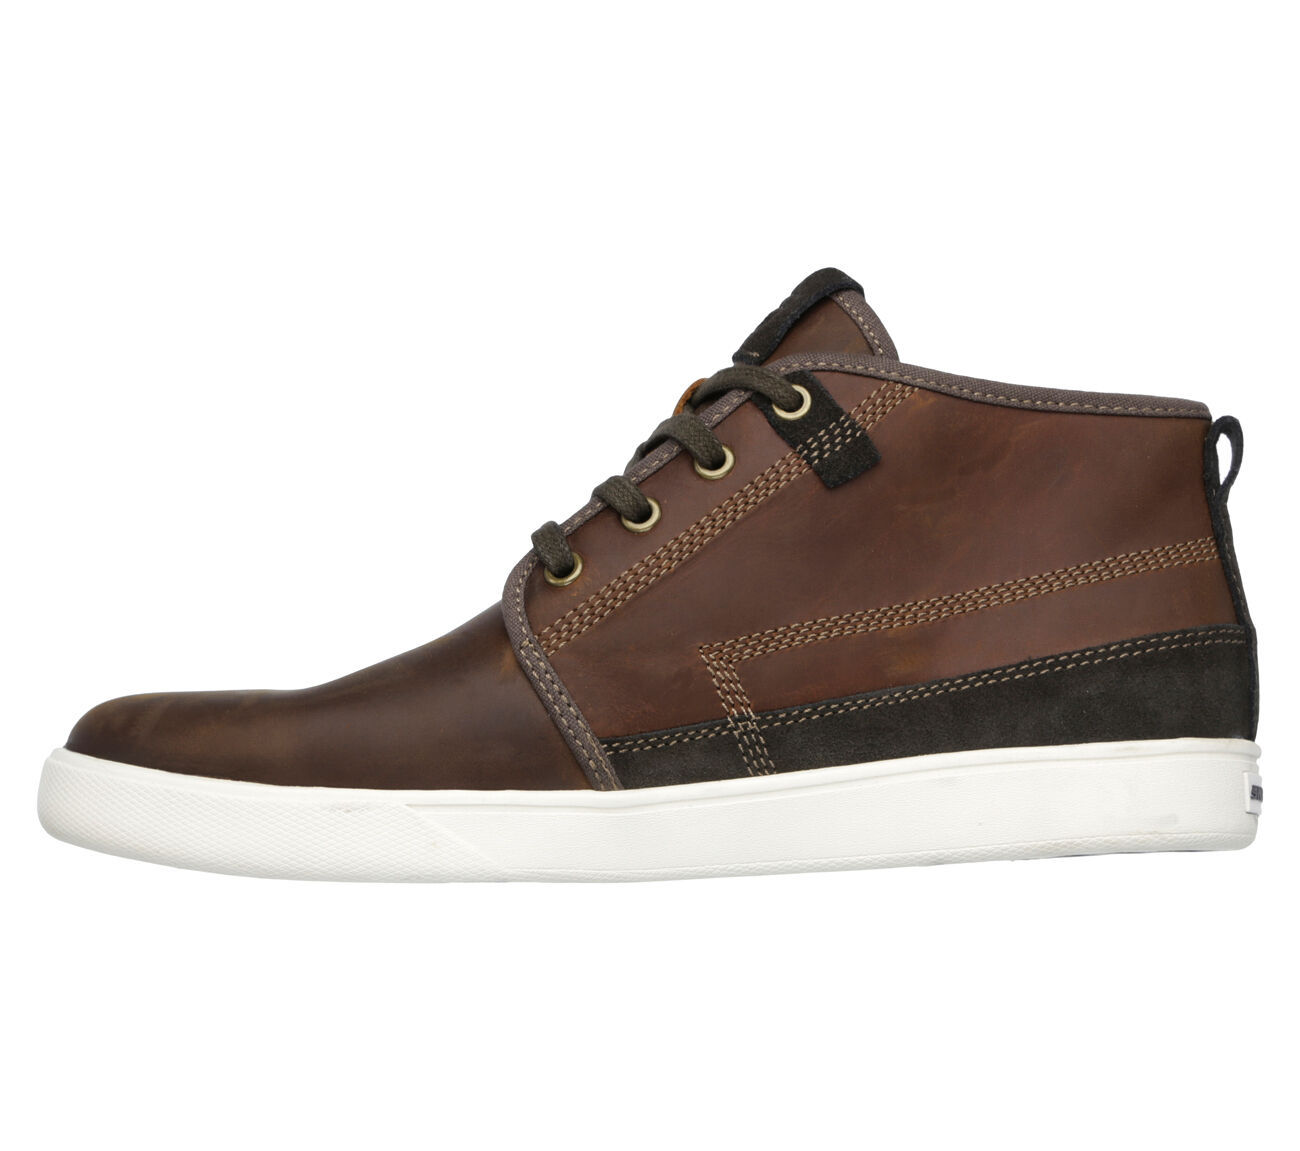 Men's SKECHERS CLASSIC FIT: Venice - Macklin Casual Shoe, 64875 CDB Sizes 8-14